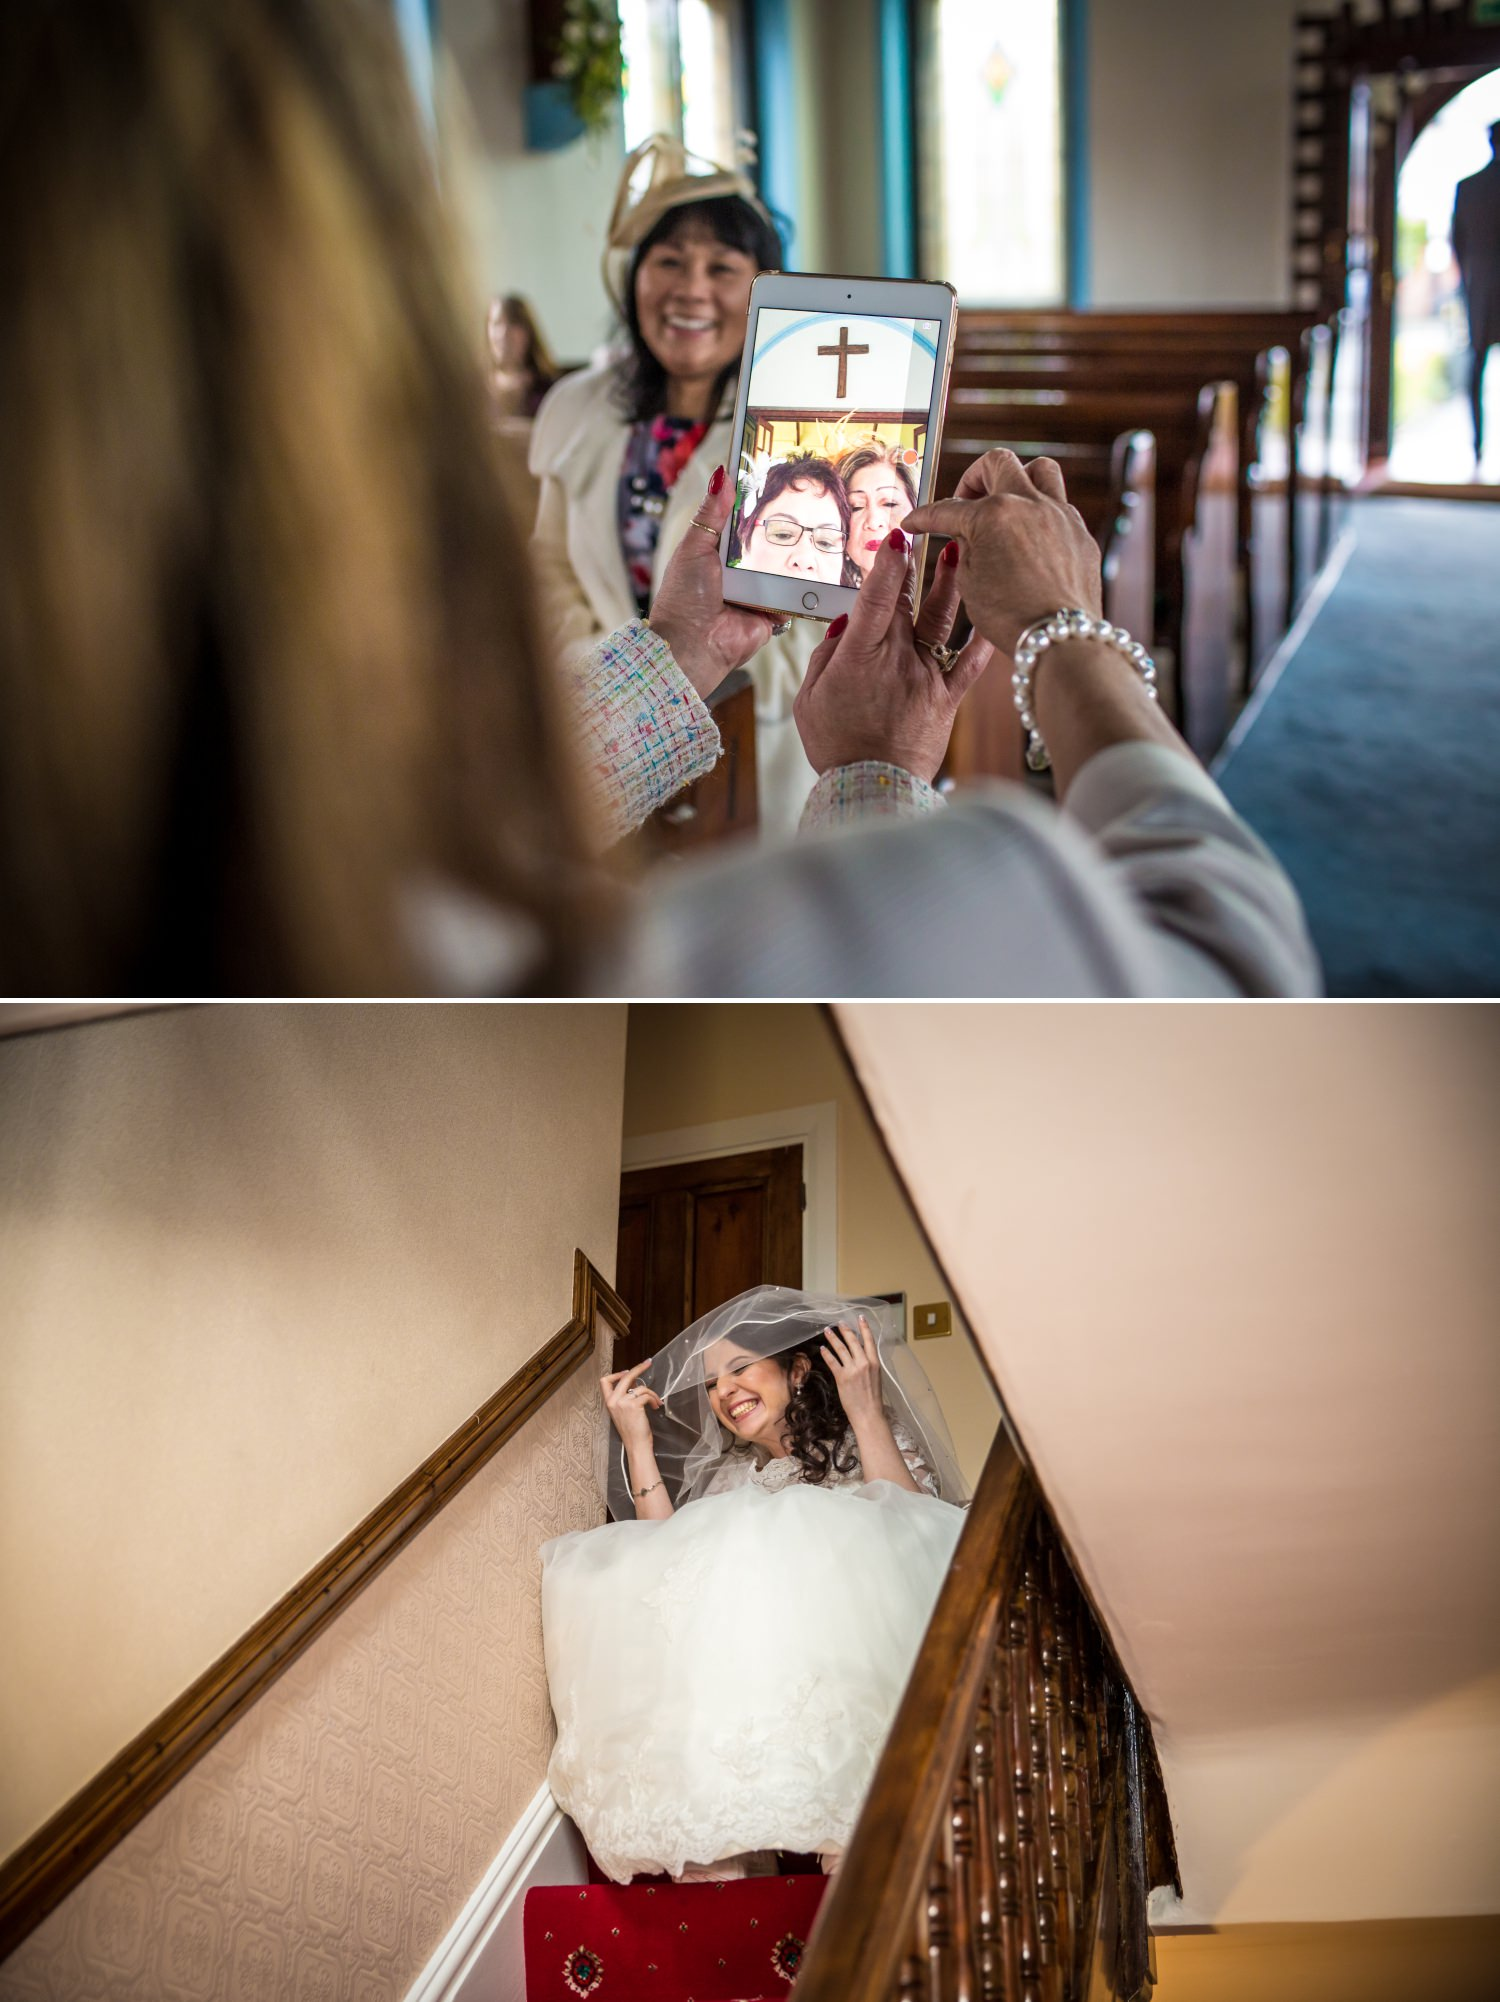 Wedding Photograph of bride getting ready at Pimhill Barn, Shropshire